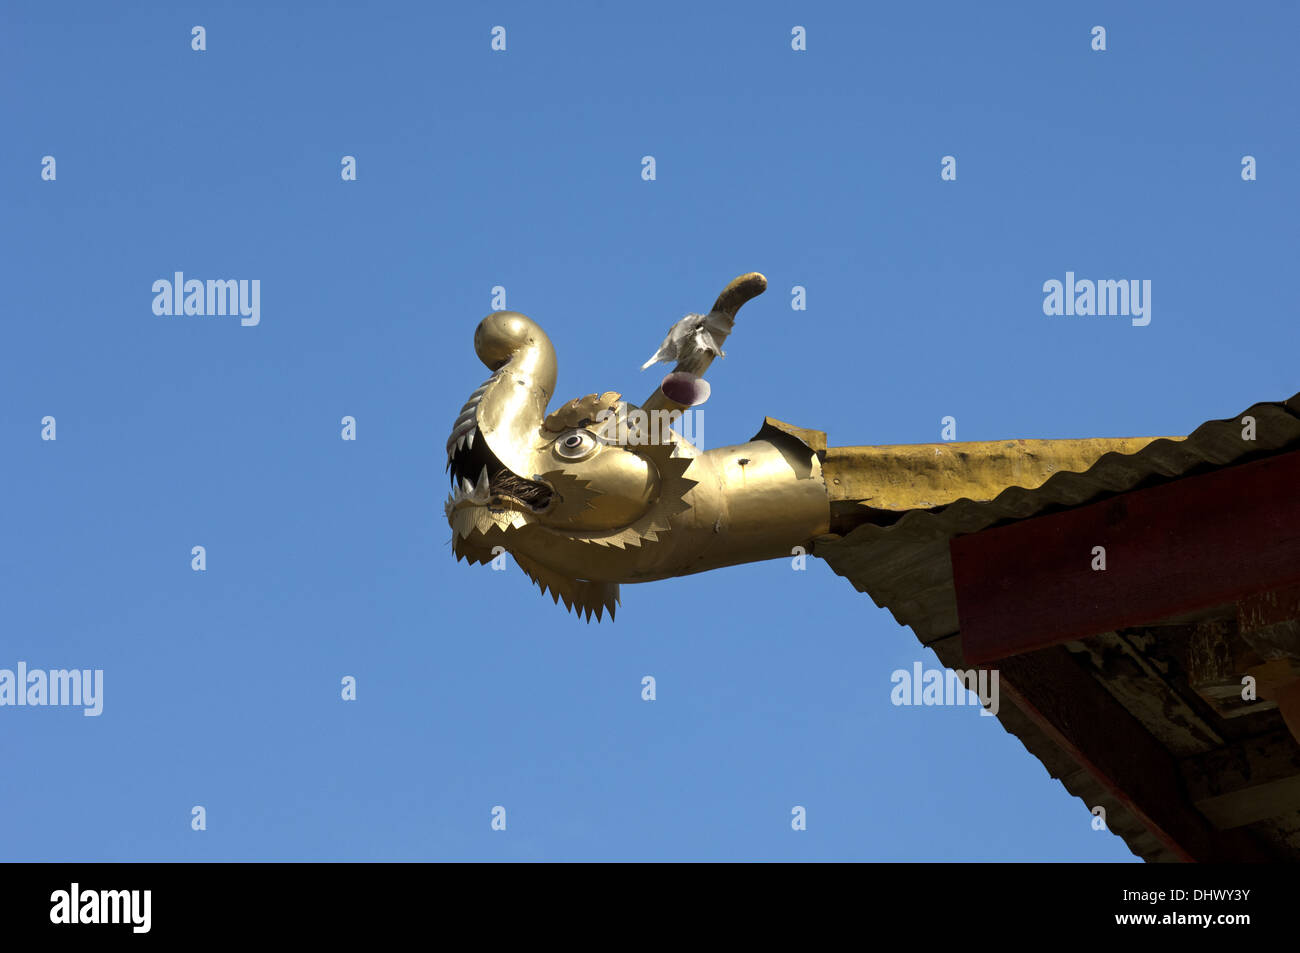 Gargoyle symbolizing a dragon, Lobesa, Bhutan - Stock Image